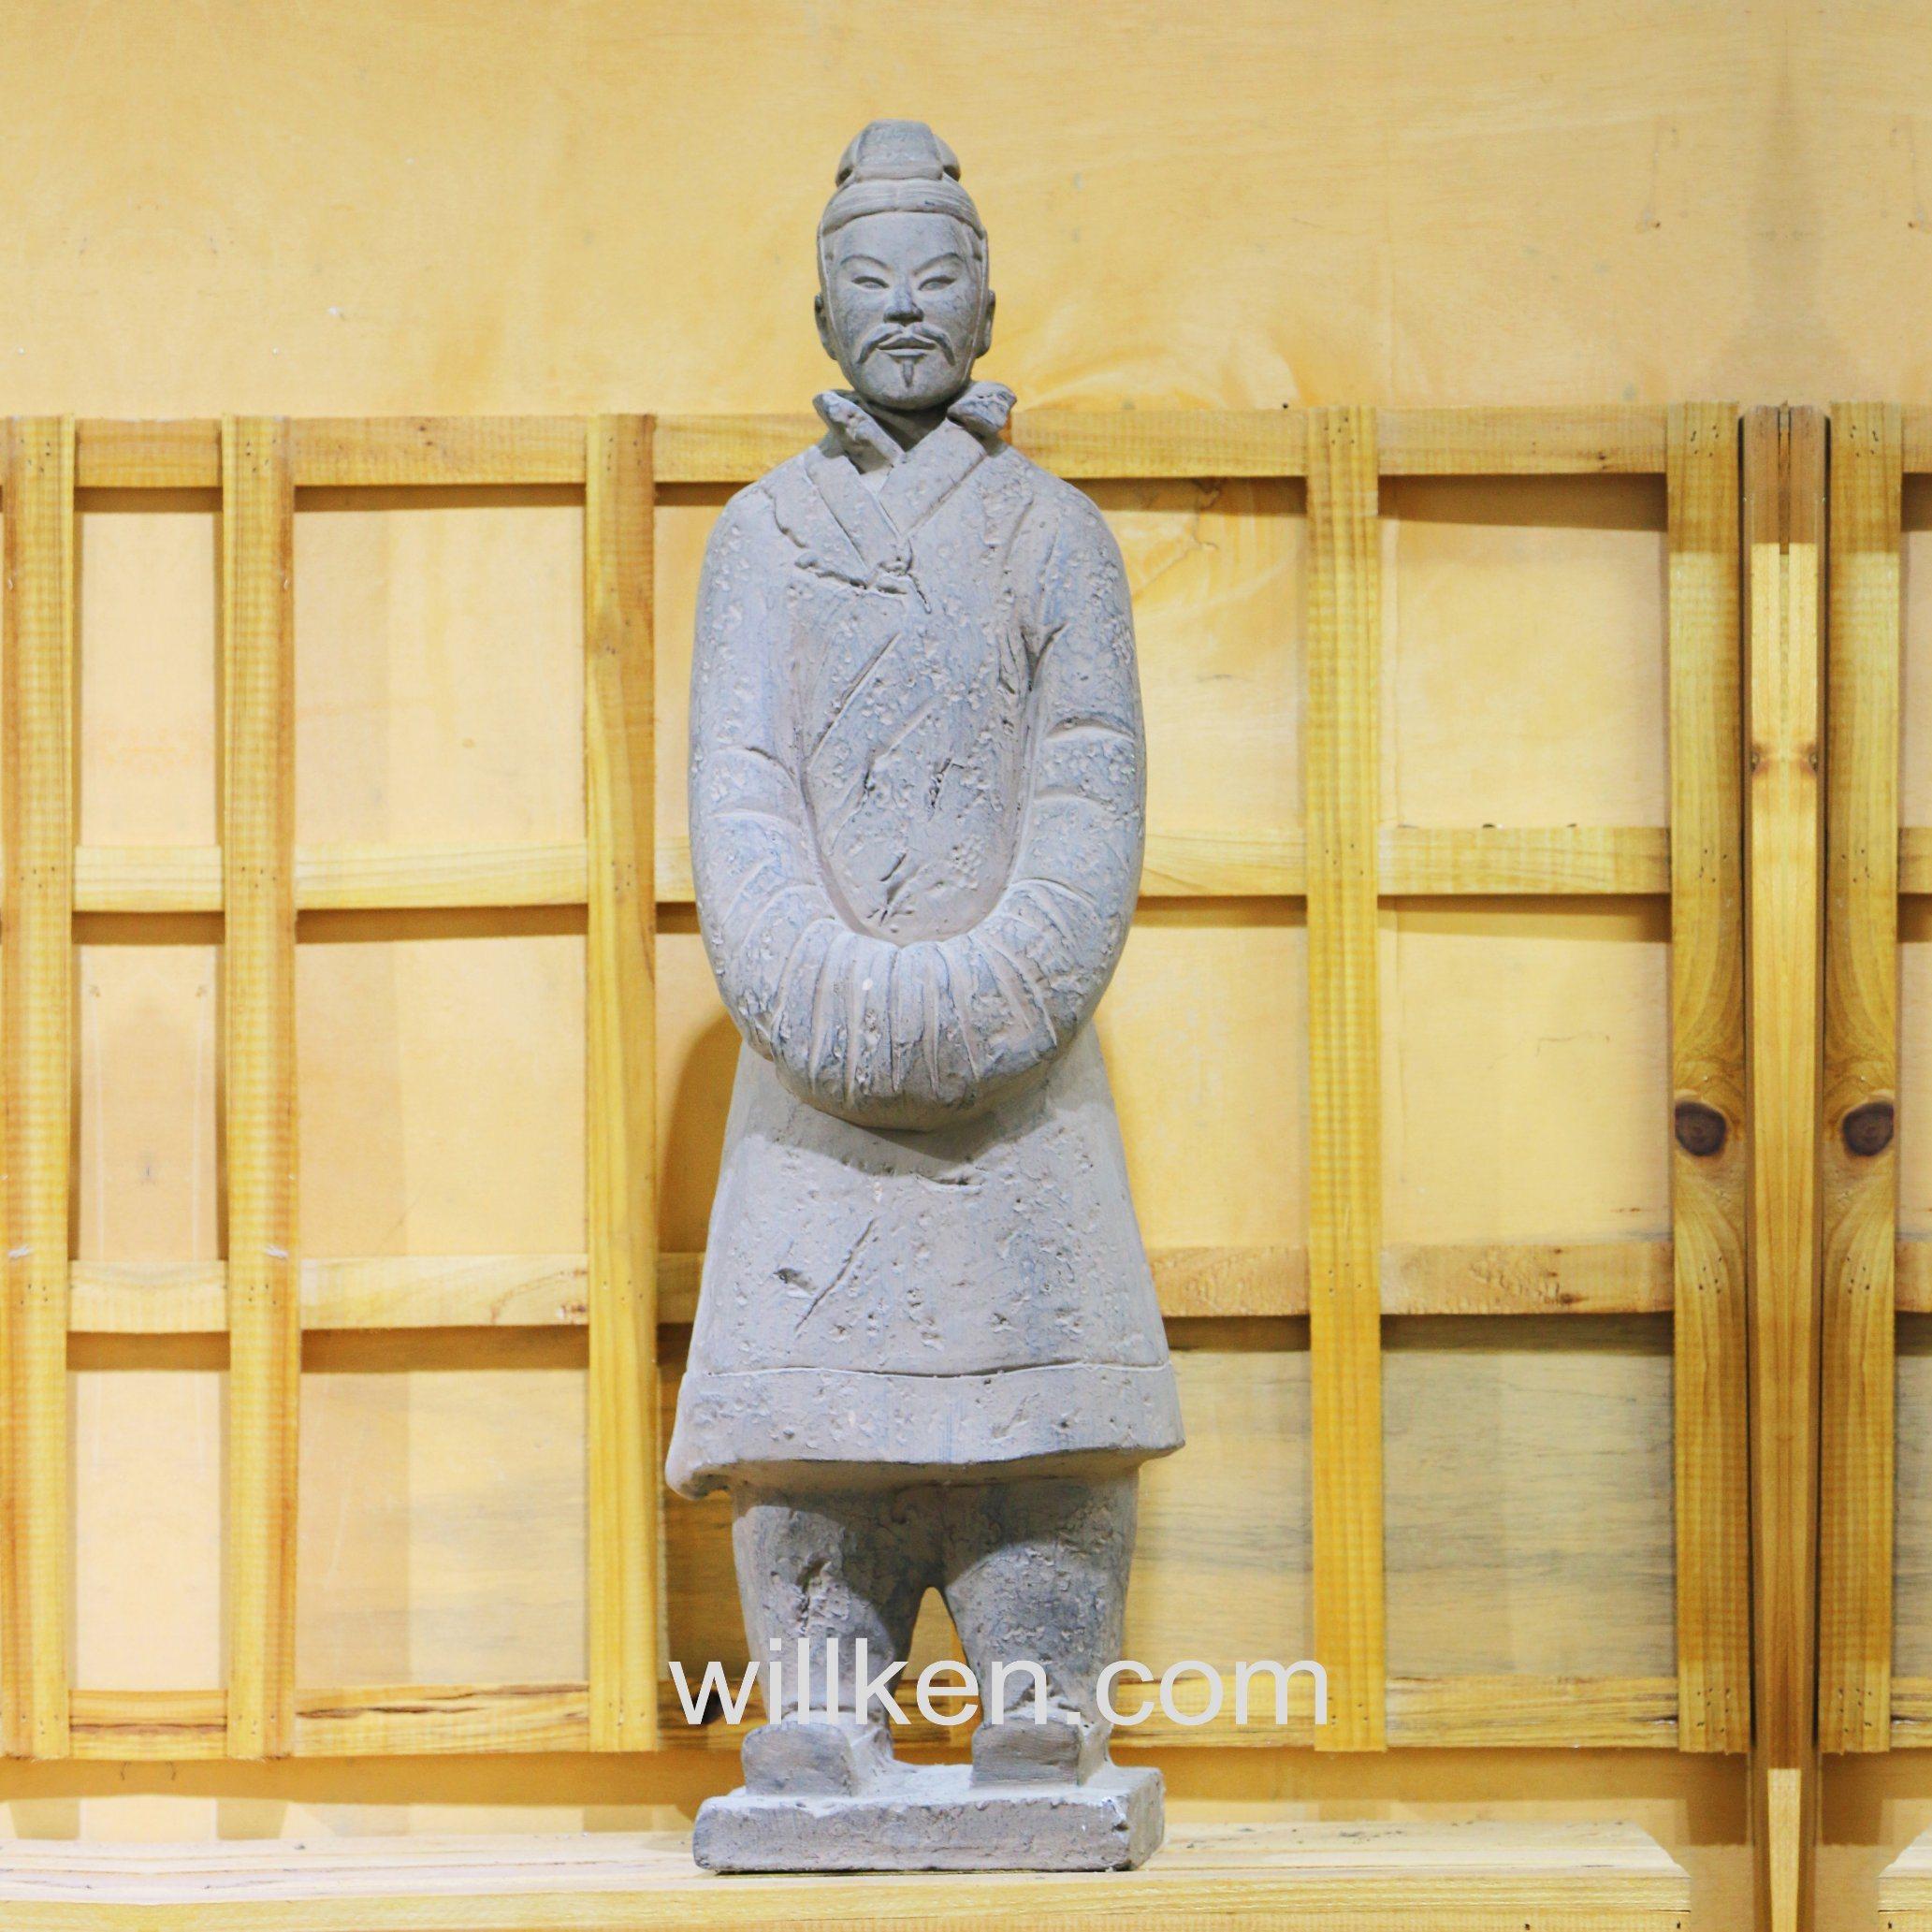 ... China Xi An Antique Statues Replica Garden Decor Terracotta Warriors ...